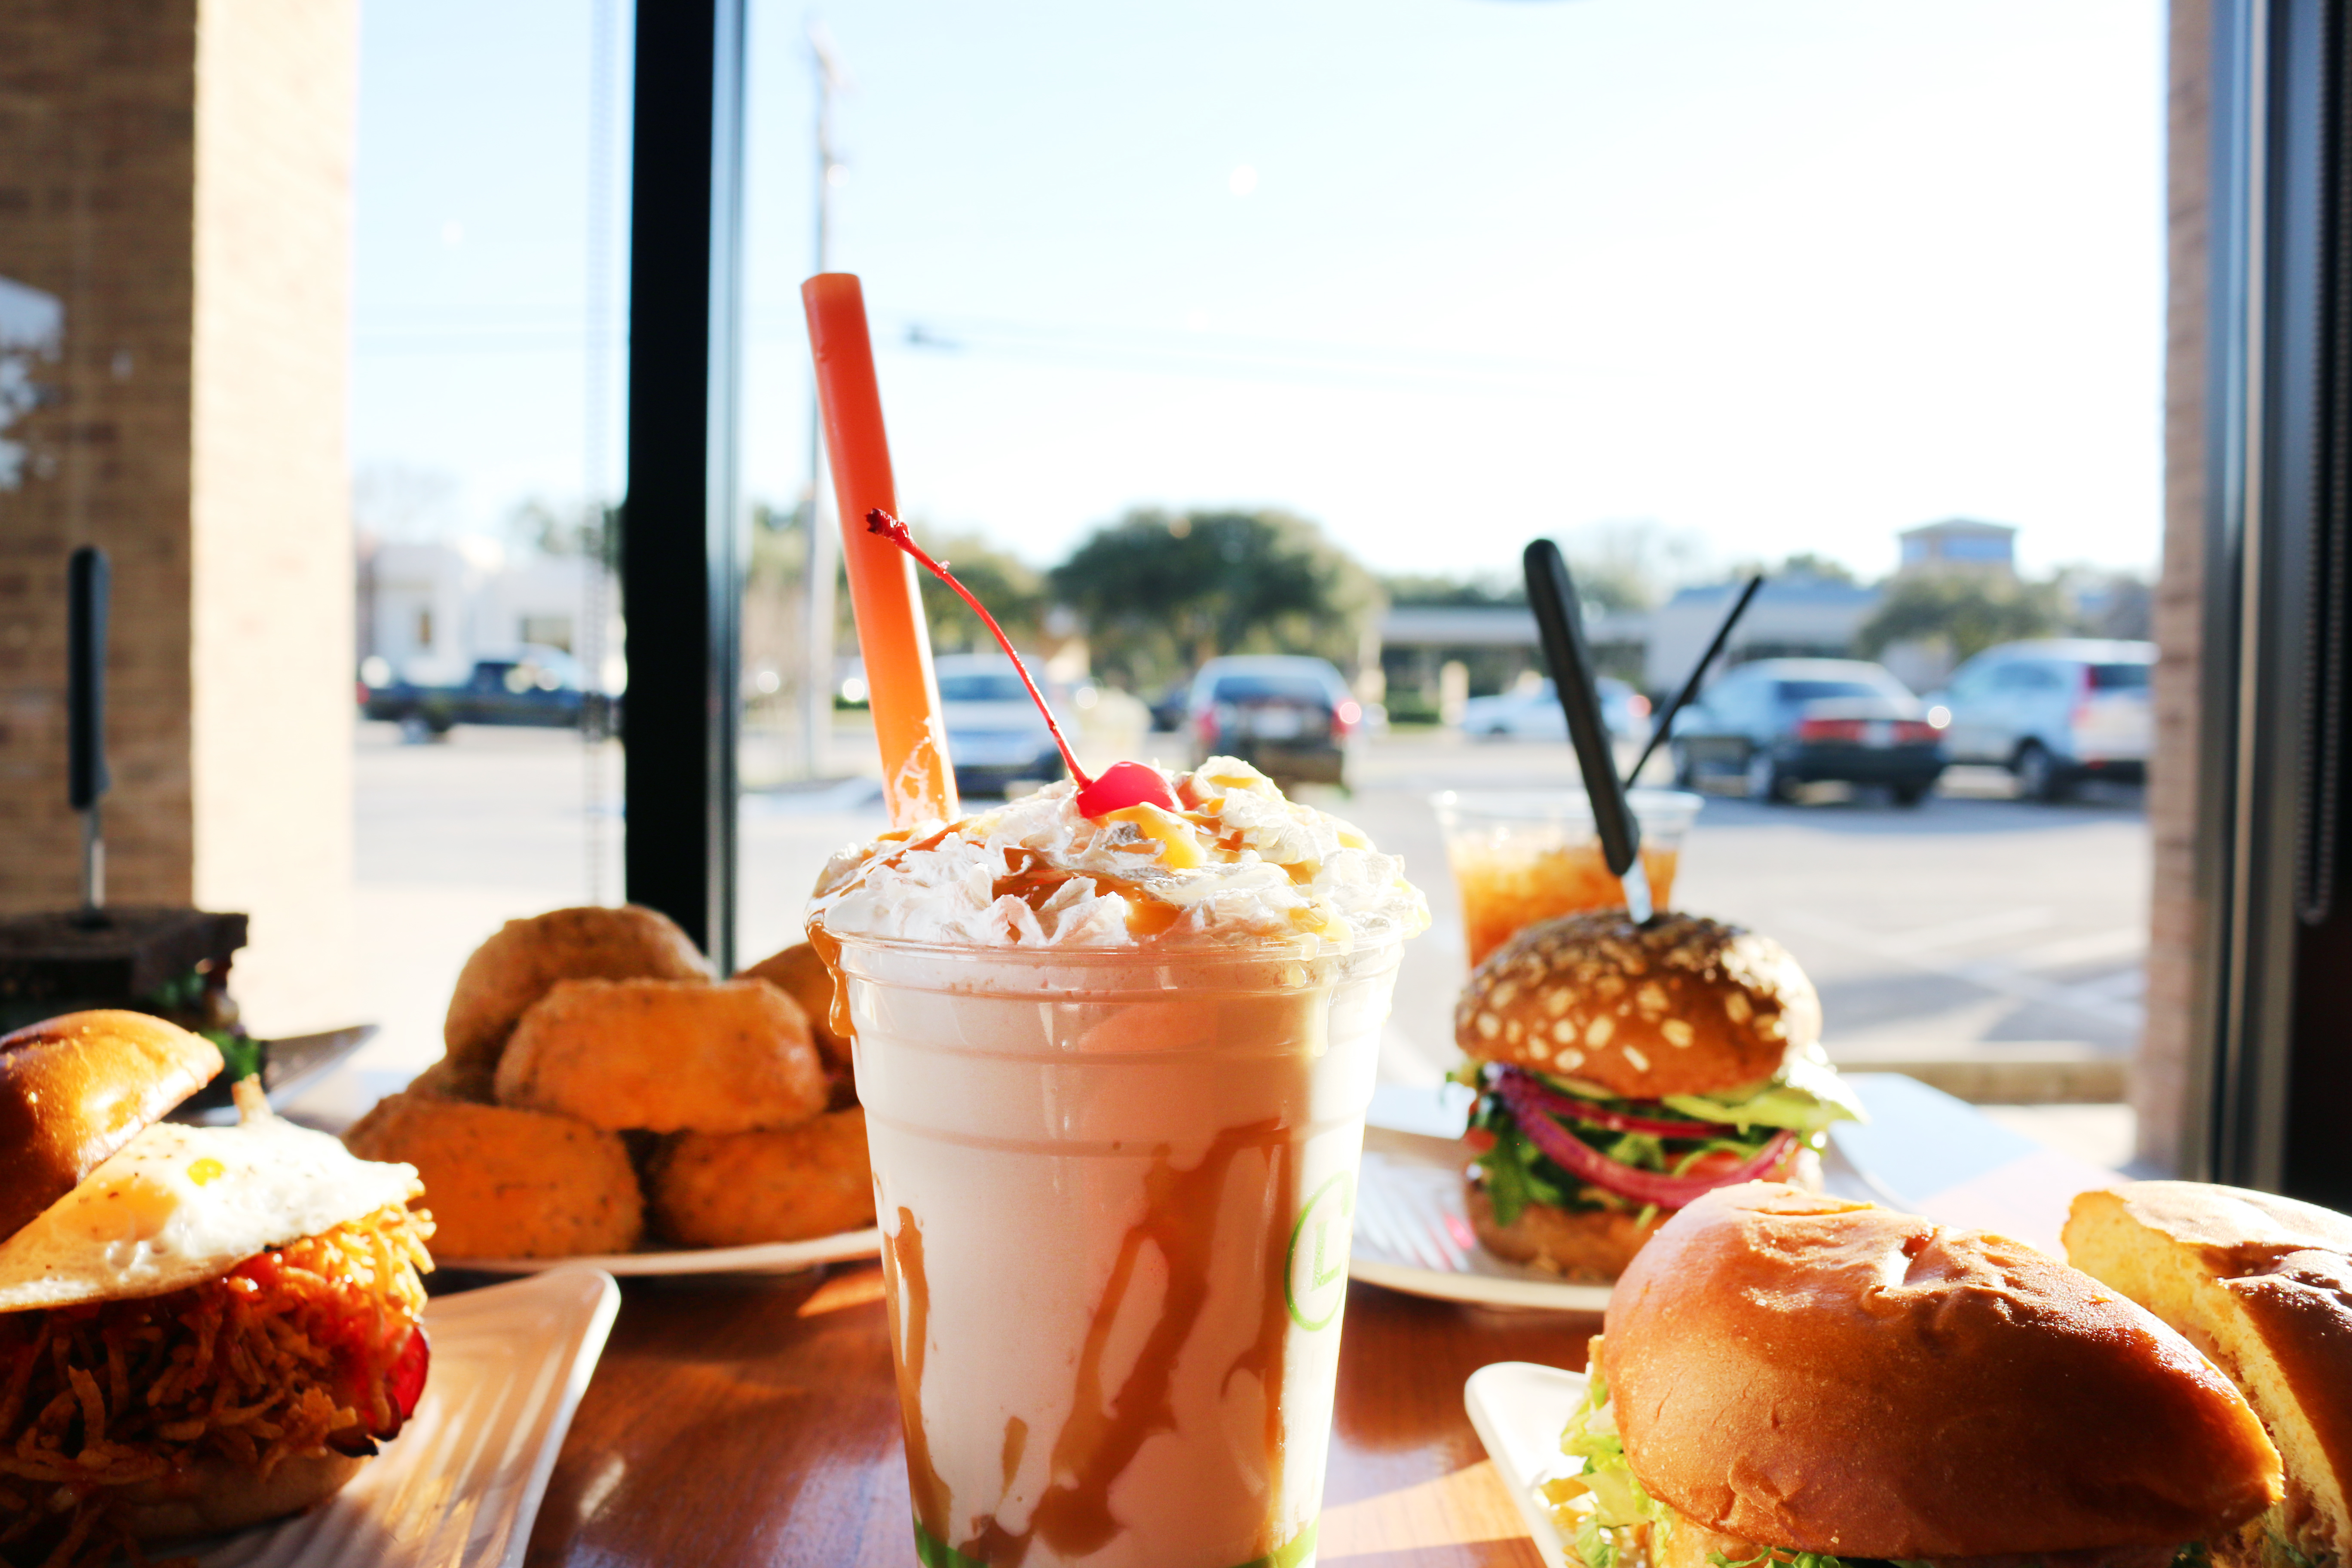 Milkshake and food overview.JPG